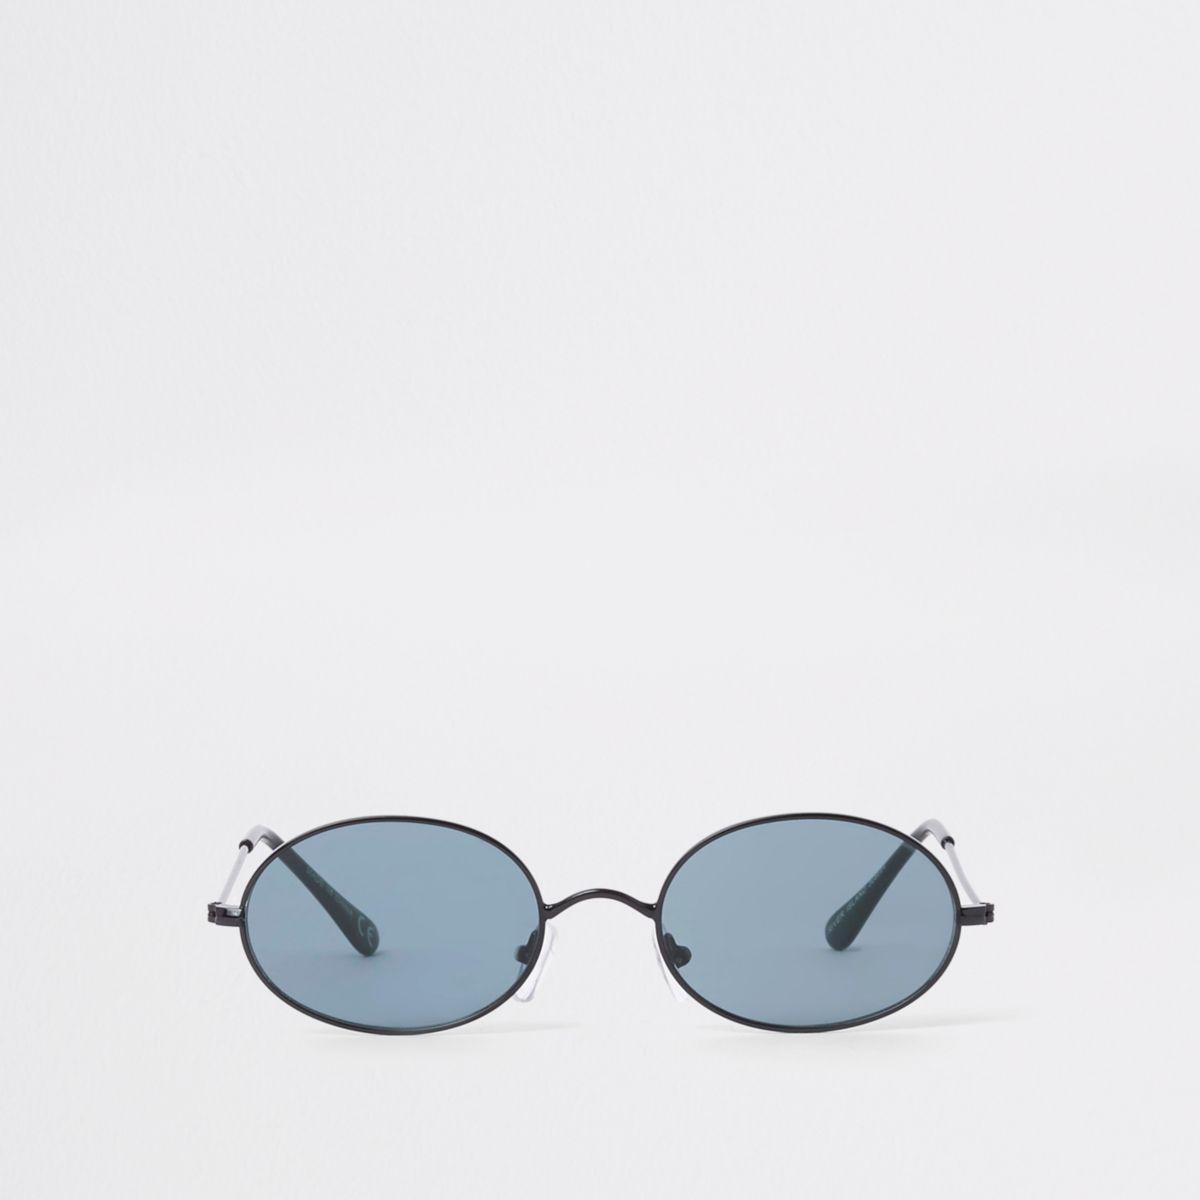 Silver tone grey lens round sunglasses